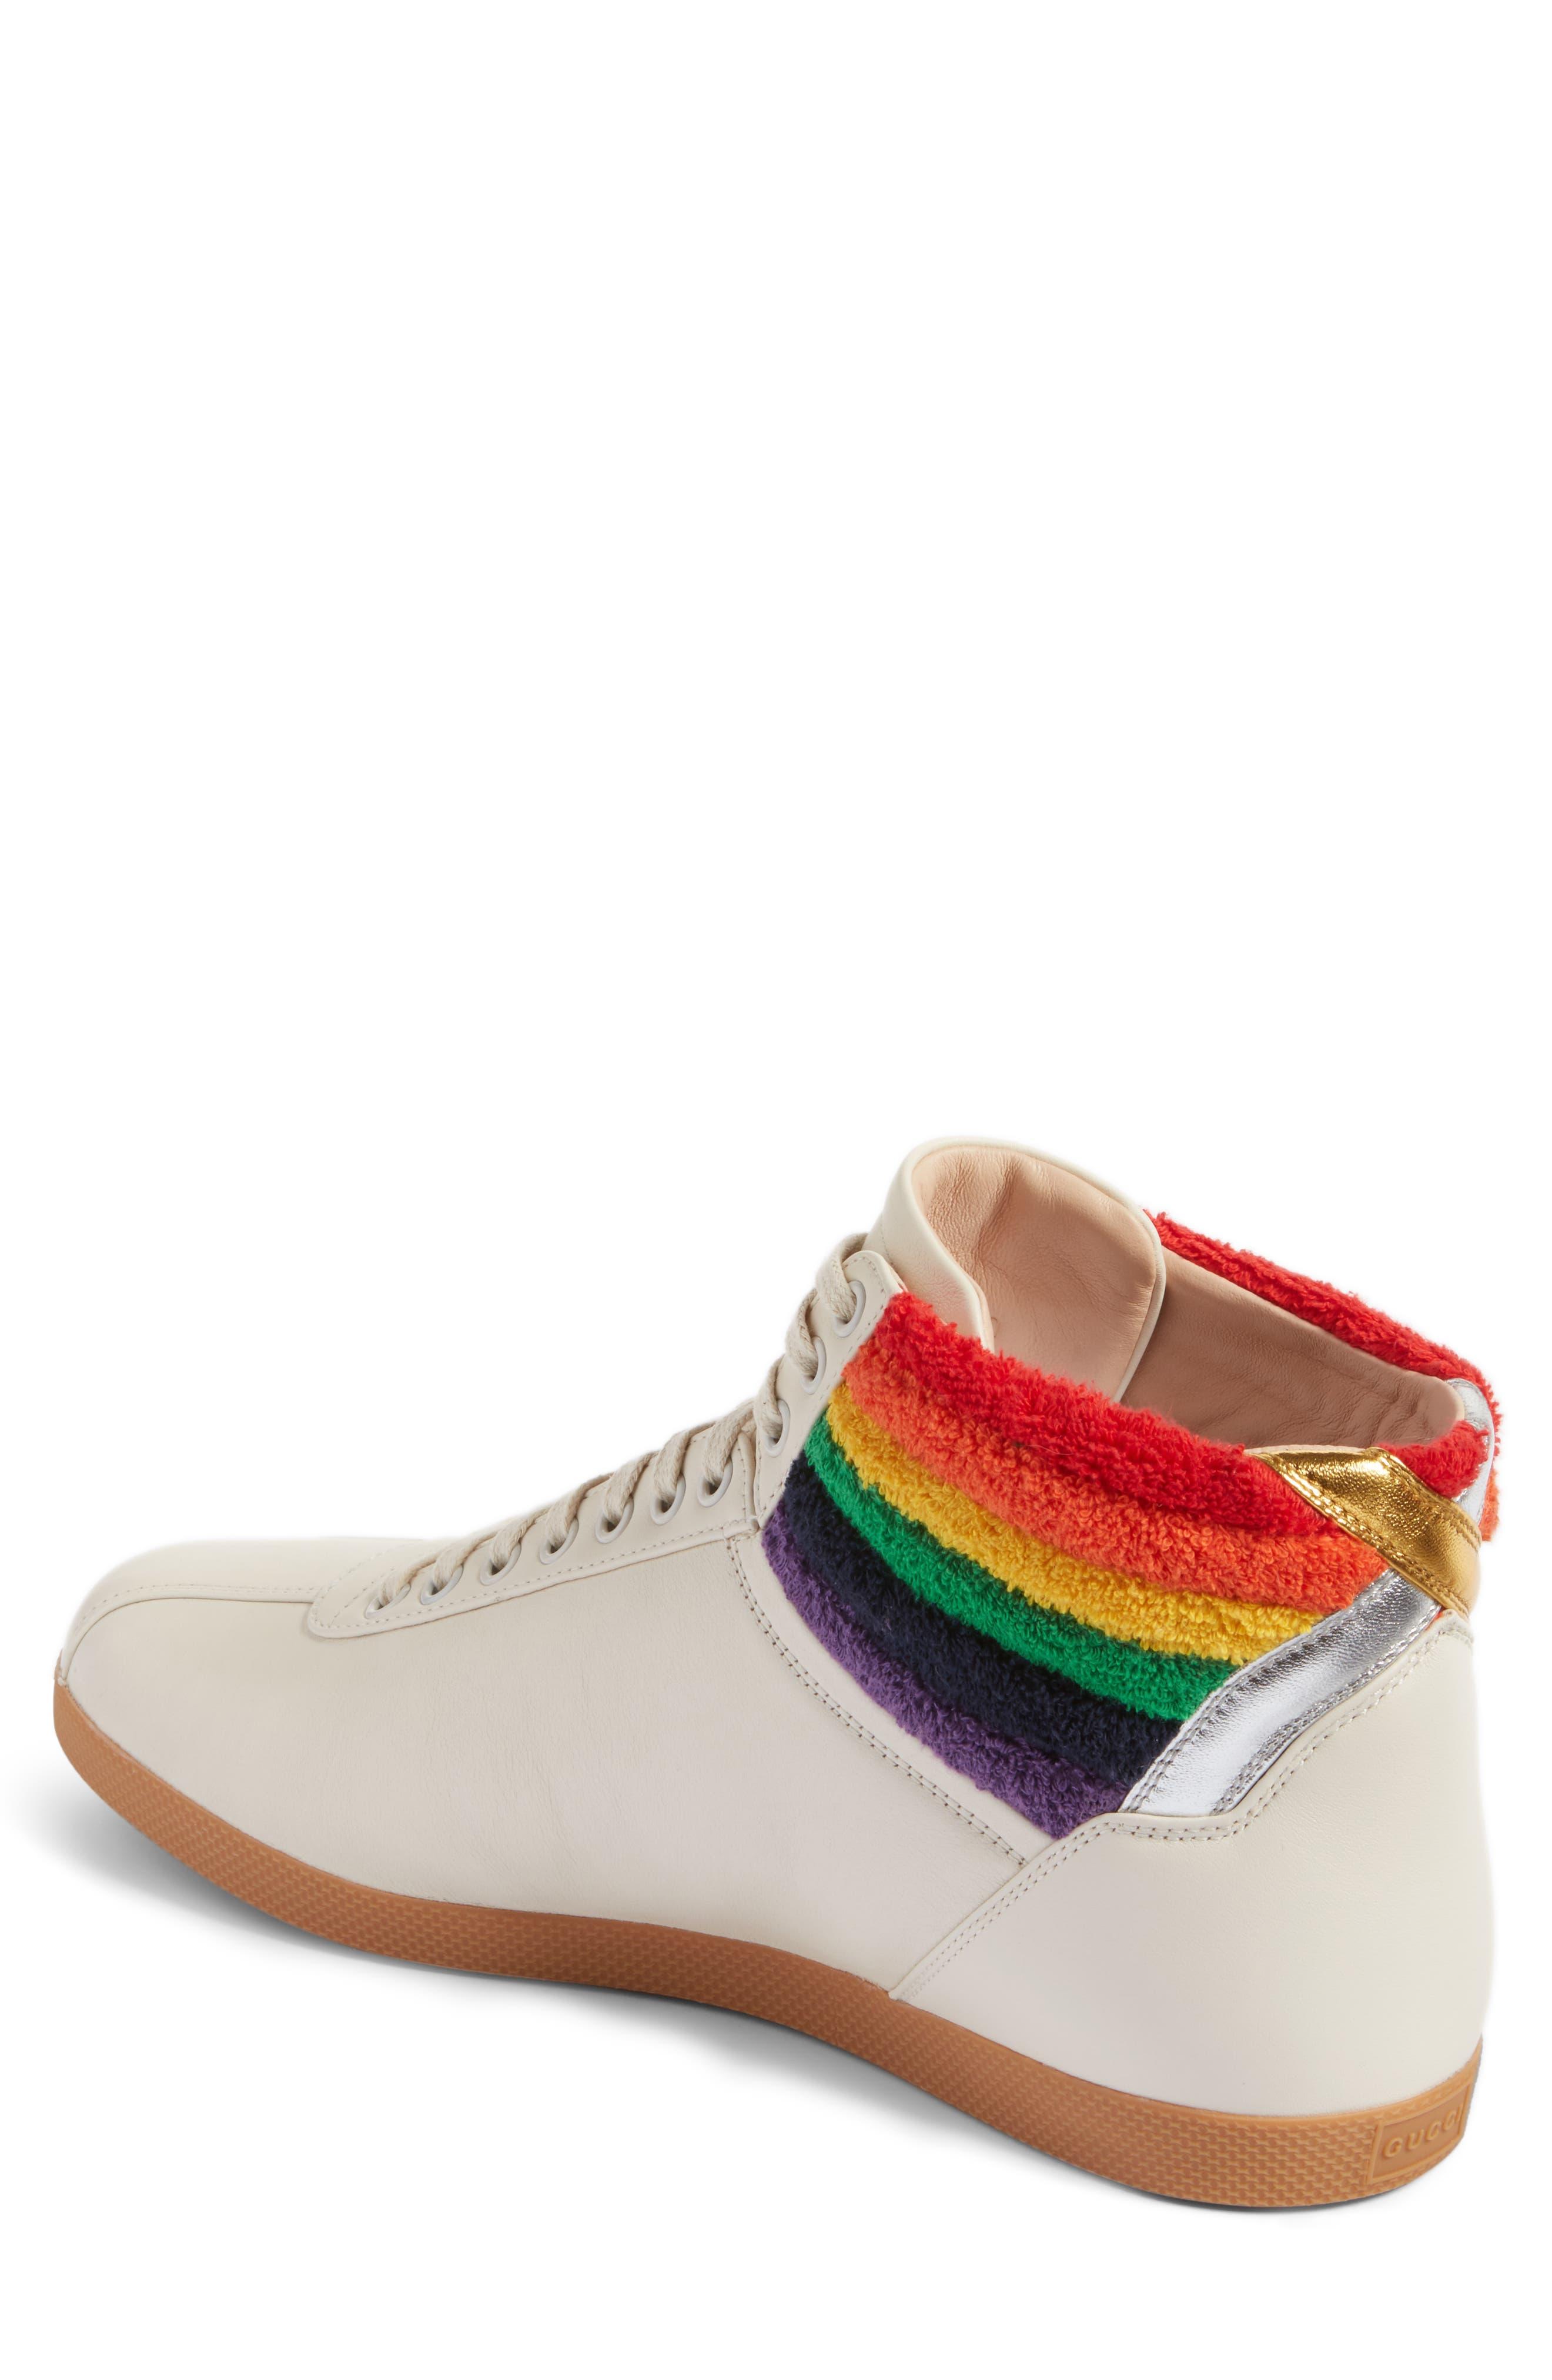 Bambi Rainbow Terry High Top Sneaker,                             Alternate thumbnail 2, color,